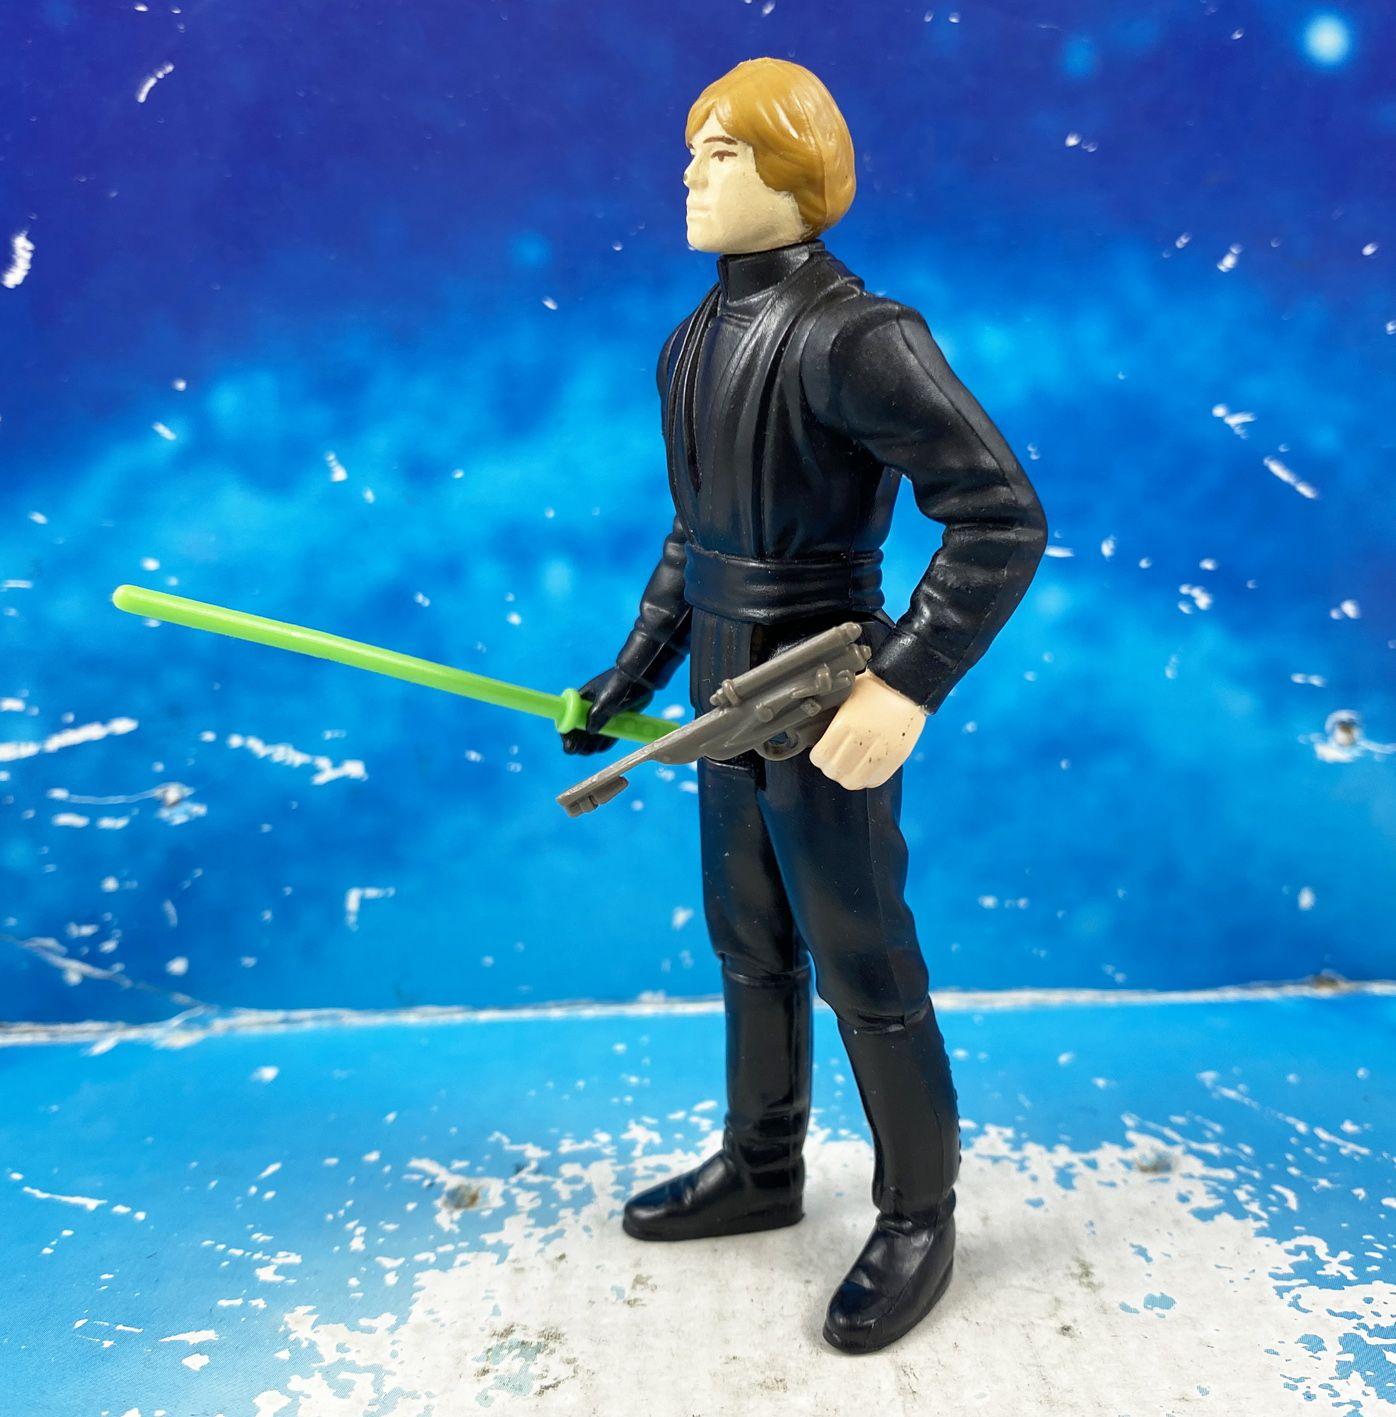 Star Wars (Return of the Jedi) - Kenner - Luke Jedi Knight  (Green Lightsaber)